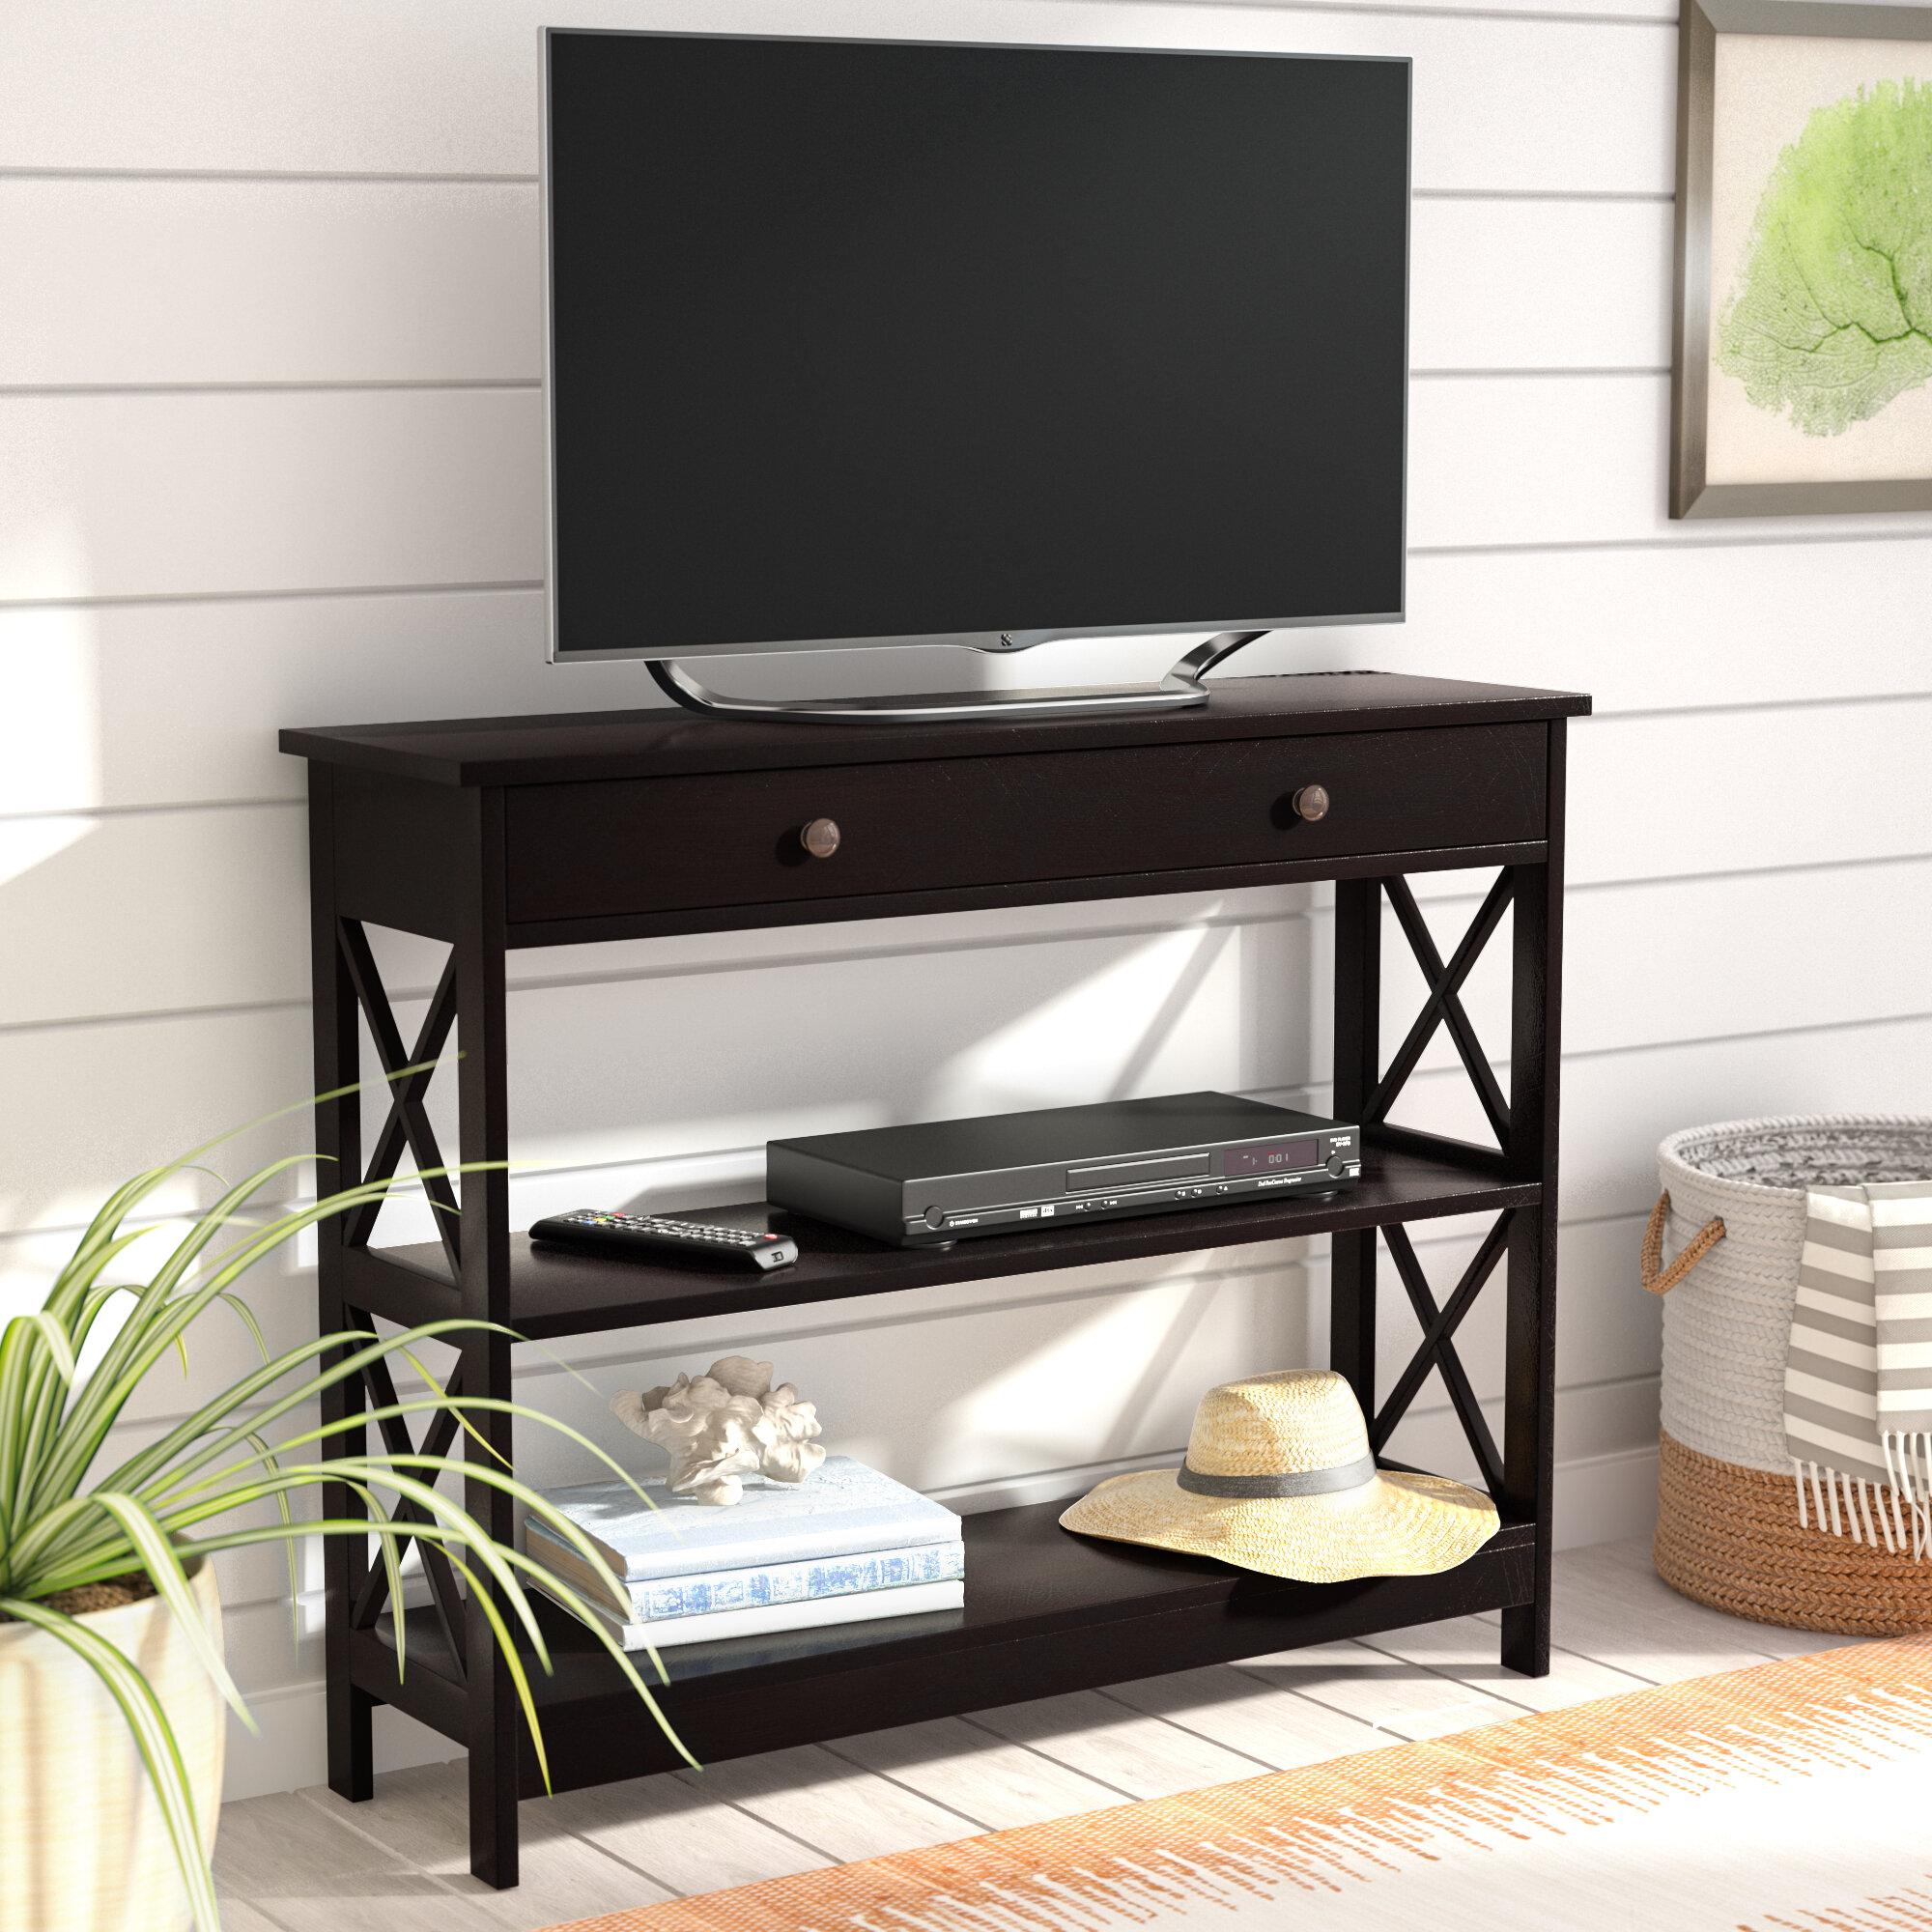 Beachcrest Home Gracelynn 1 Drawer Console Table U0026 Reviews | Wayfair